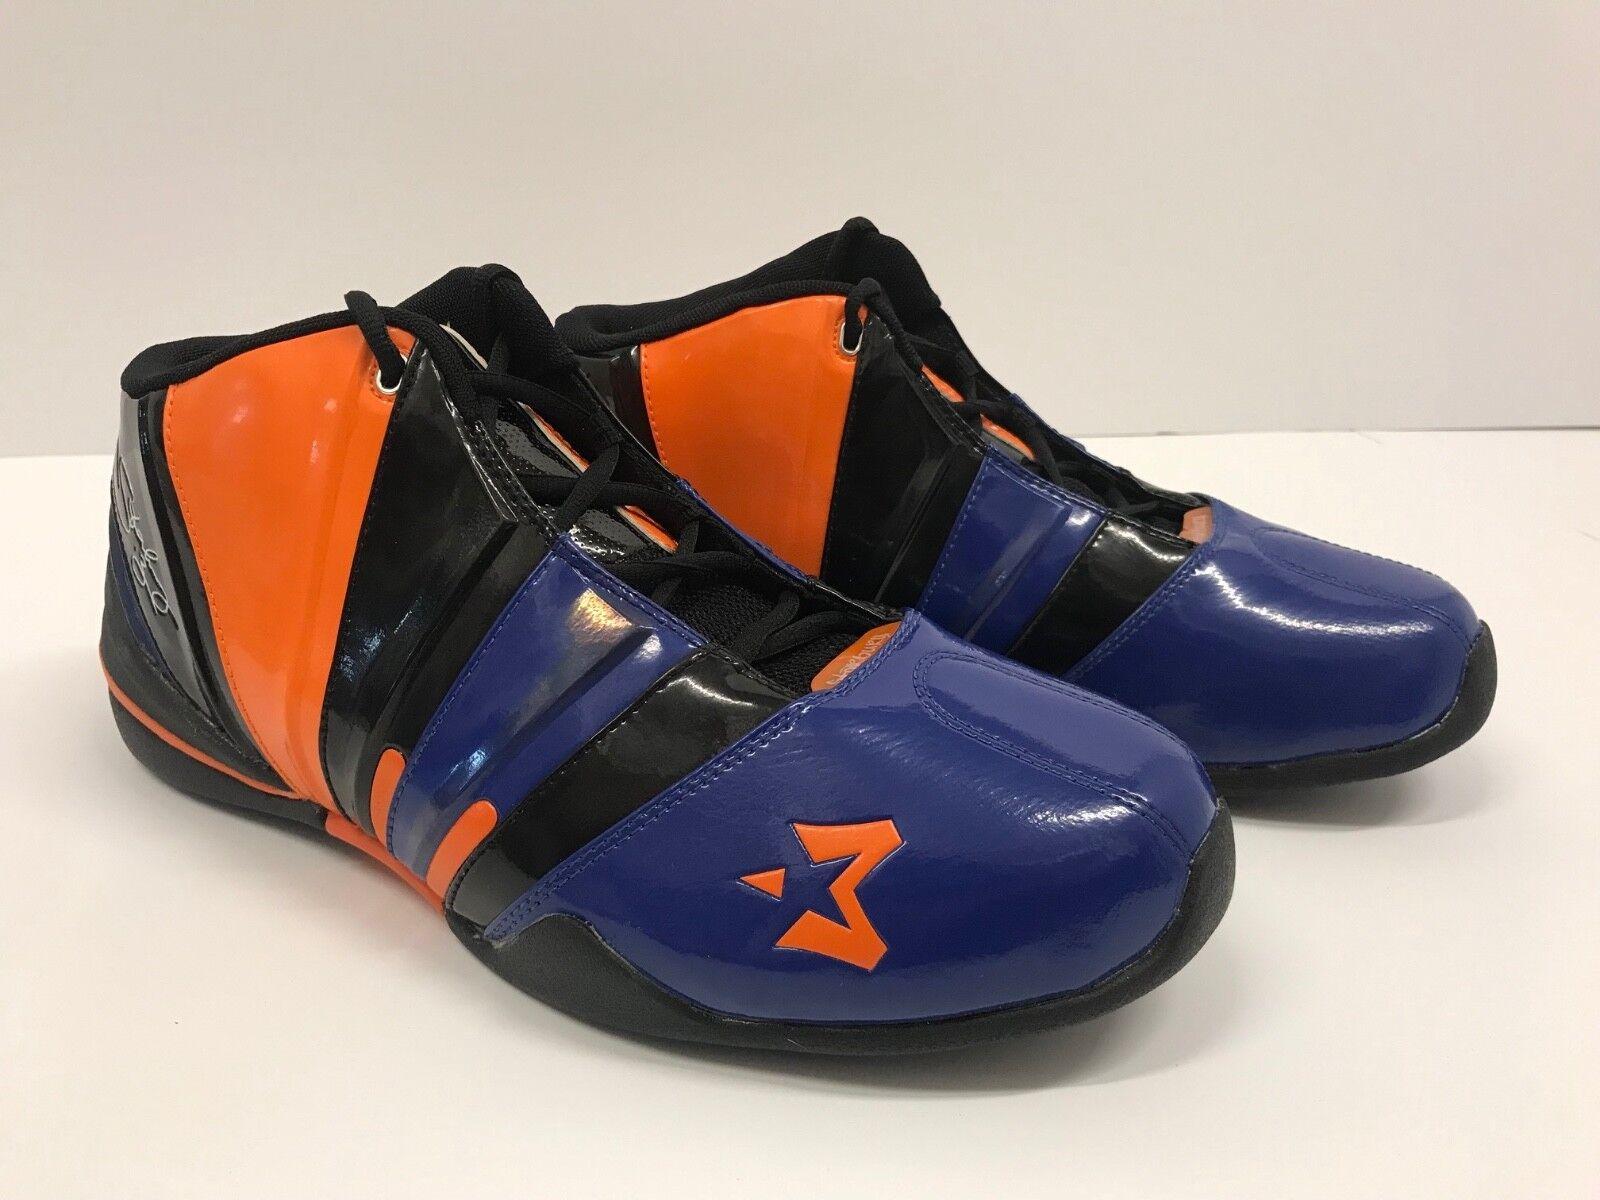 STARBURY - ultra shiny - VINTAGE - Starbury 2 - BRAND NEW - patent leather - 13